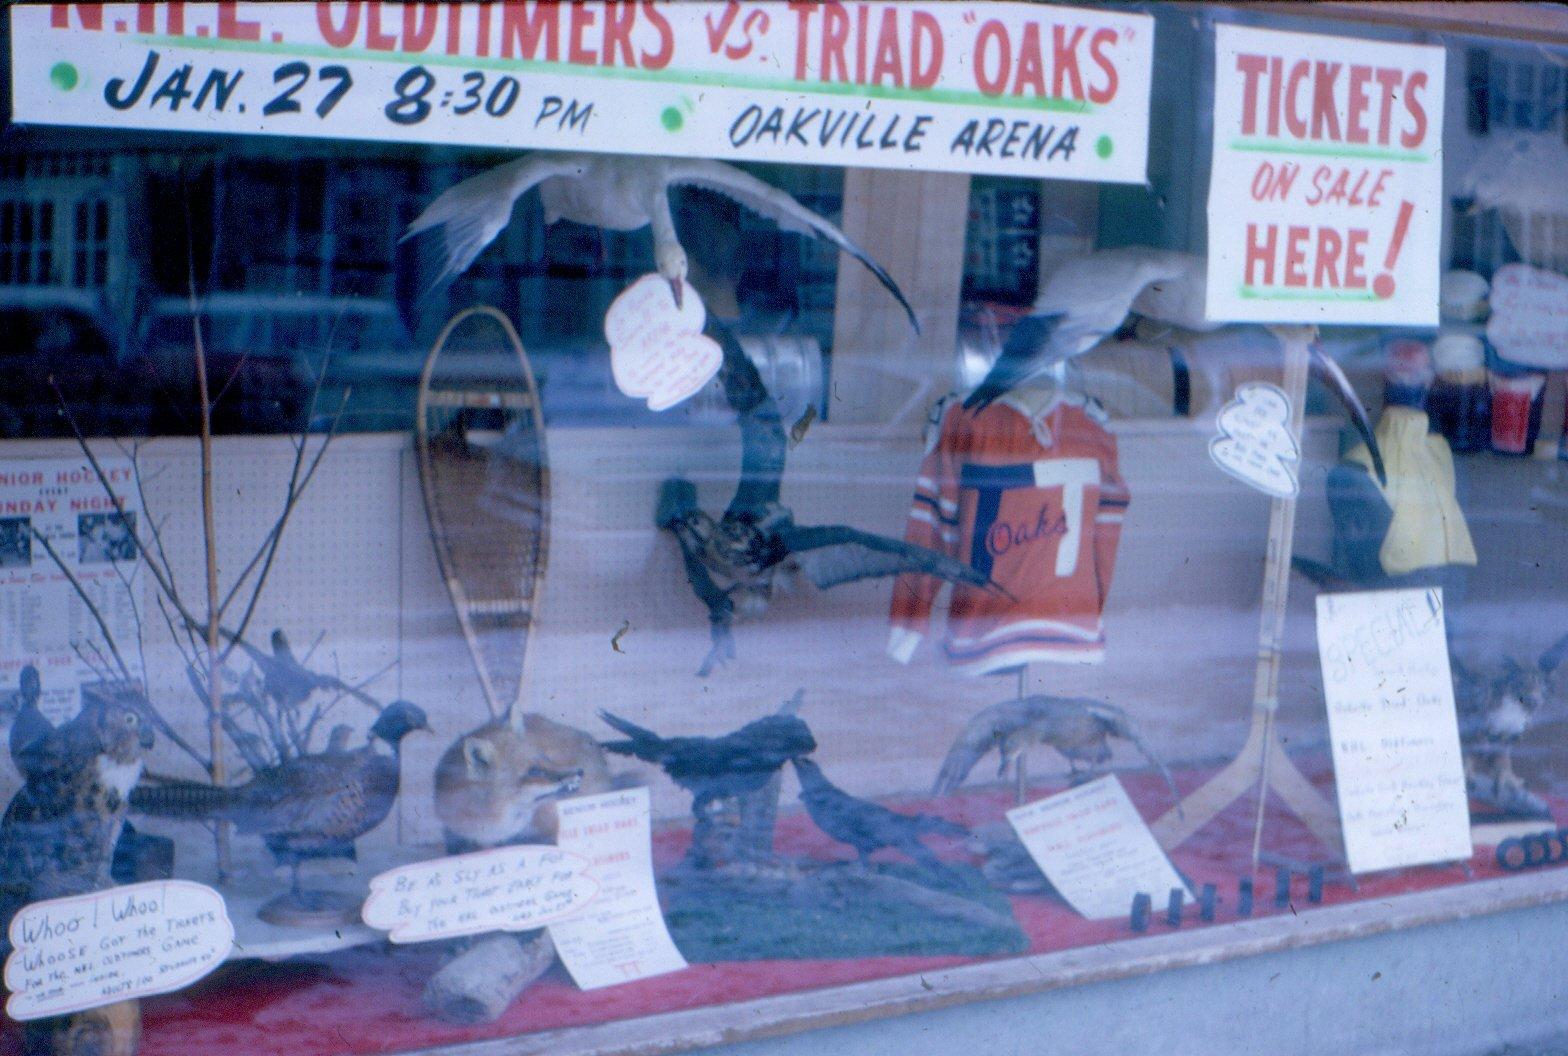 Sporting Goods Display